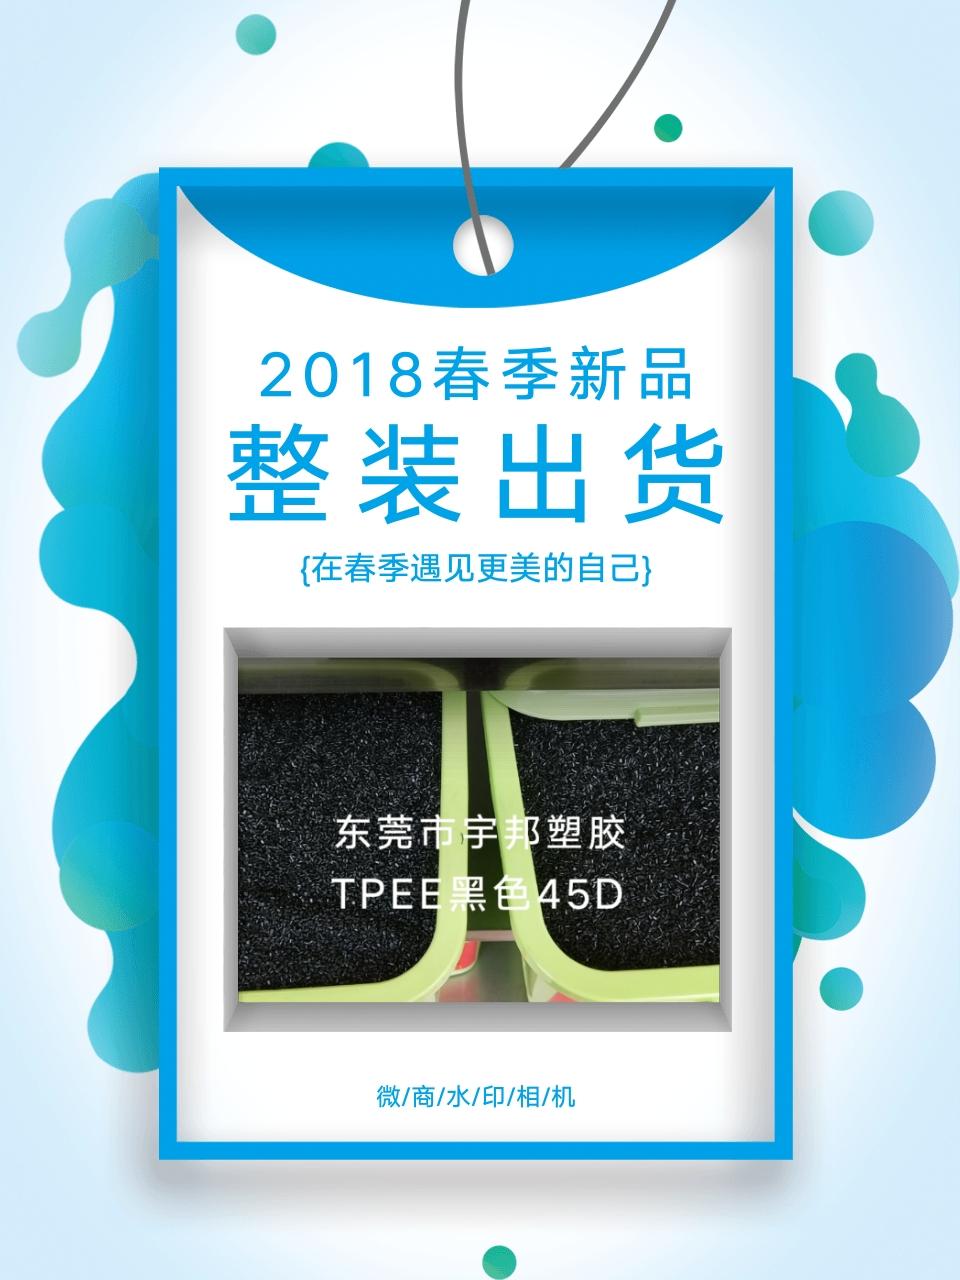 TPEE黑色颗粒45D 公司以TPEE树脂为基础,宇邦一直致力于成为业界专业的厂商之一